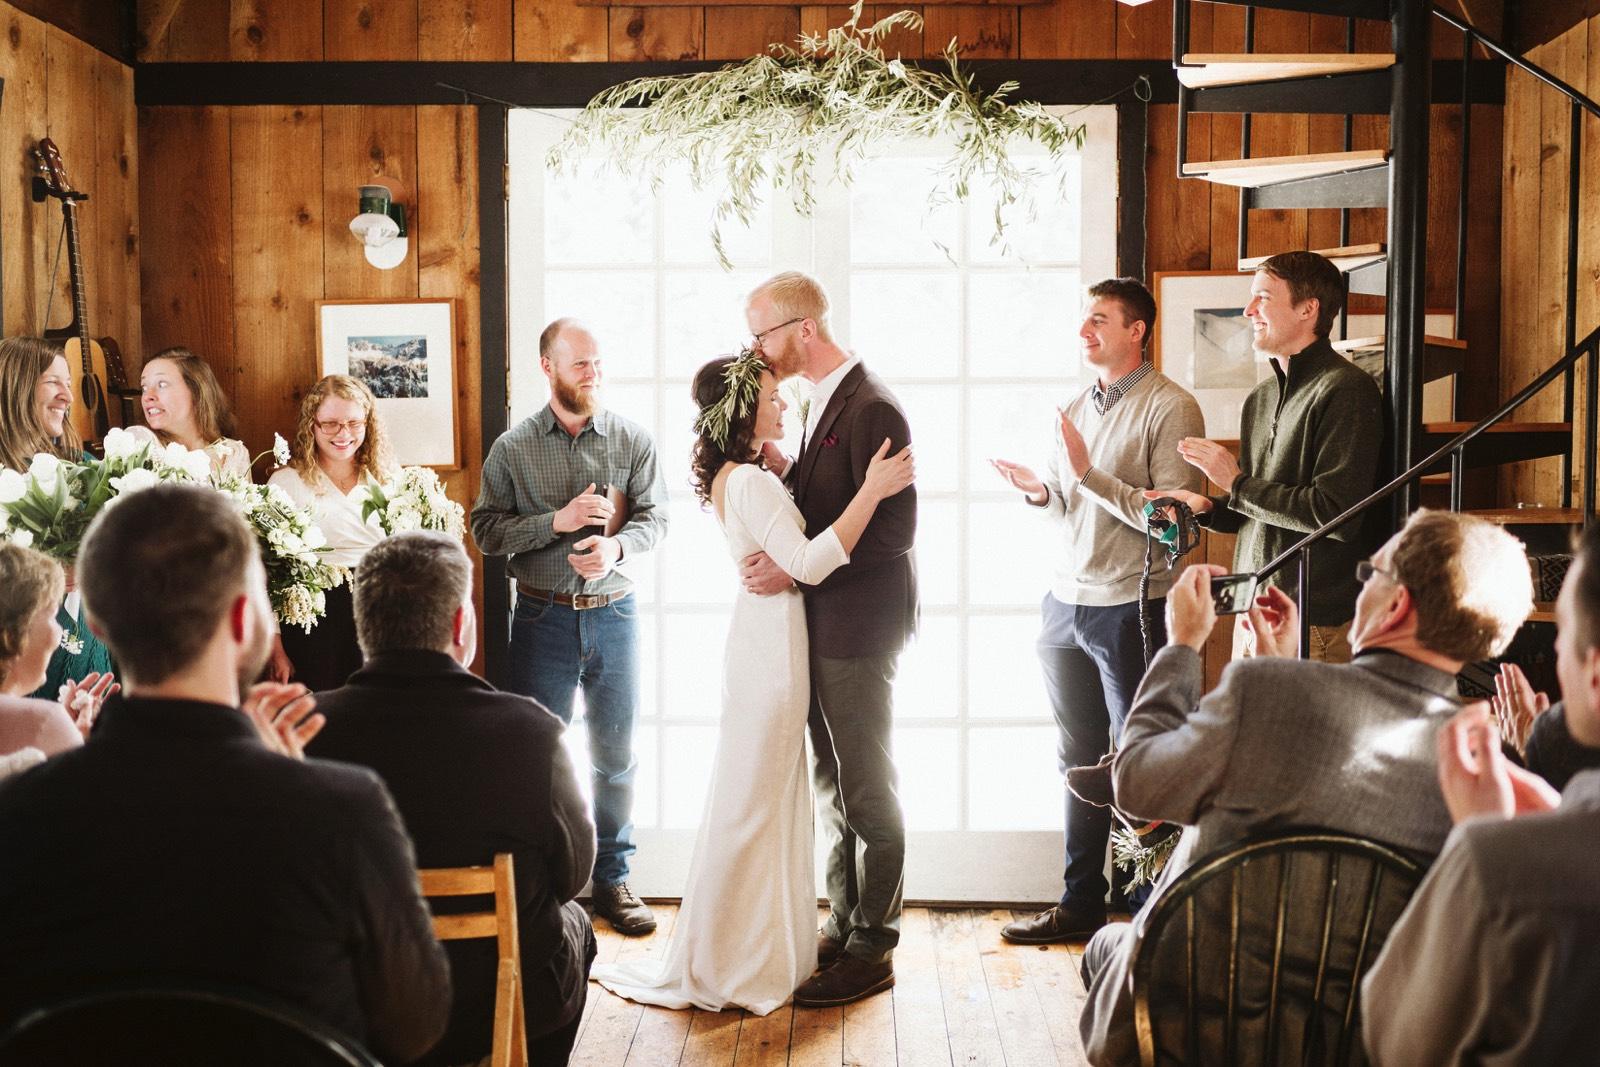 alpine-lakes-high-camp-winter-wedding-41 ALPINE LAKES HIGH CAMP WEDDING